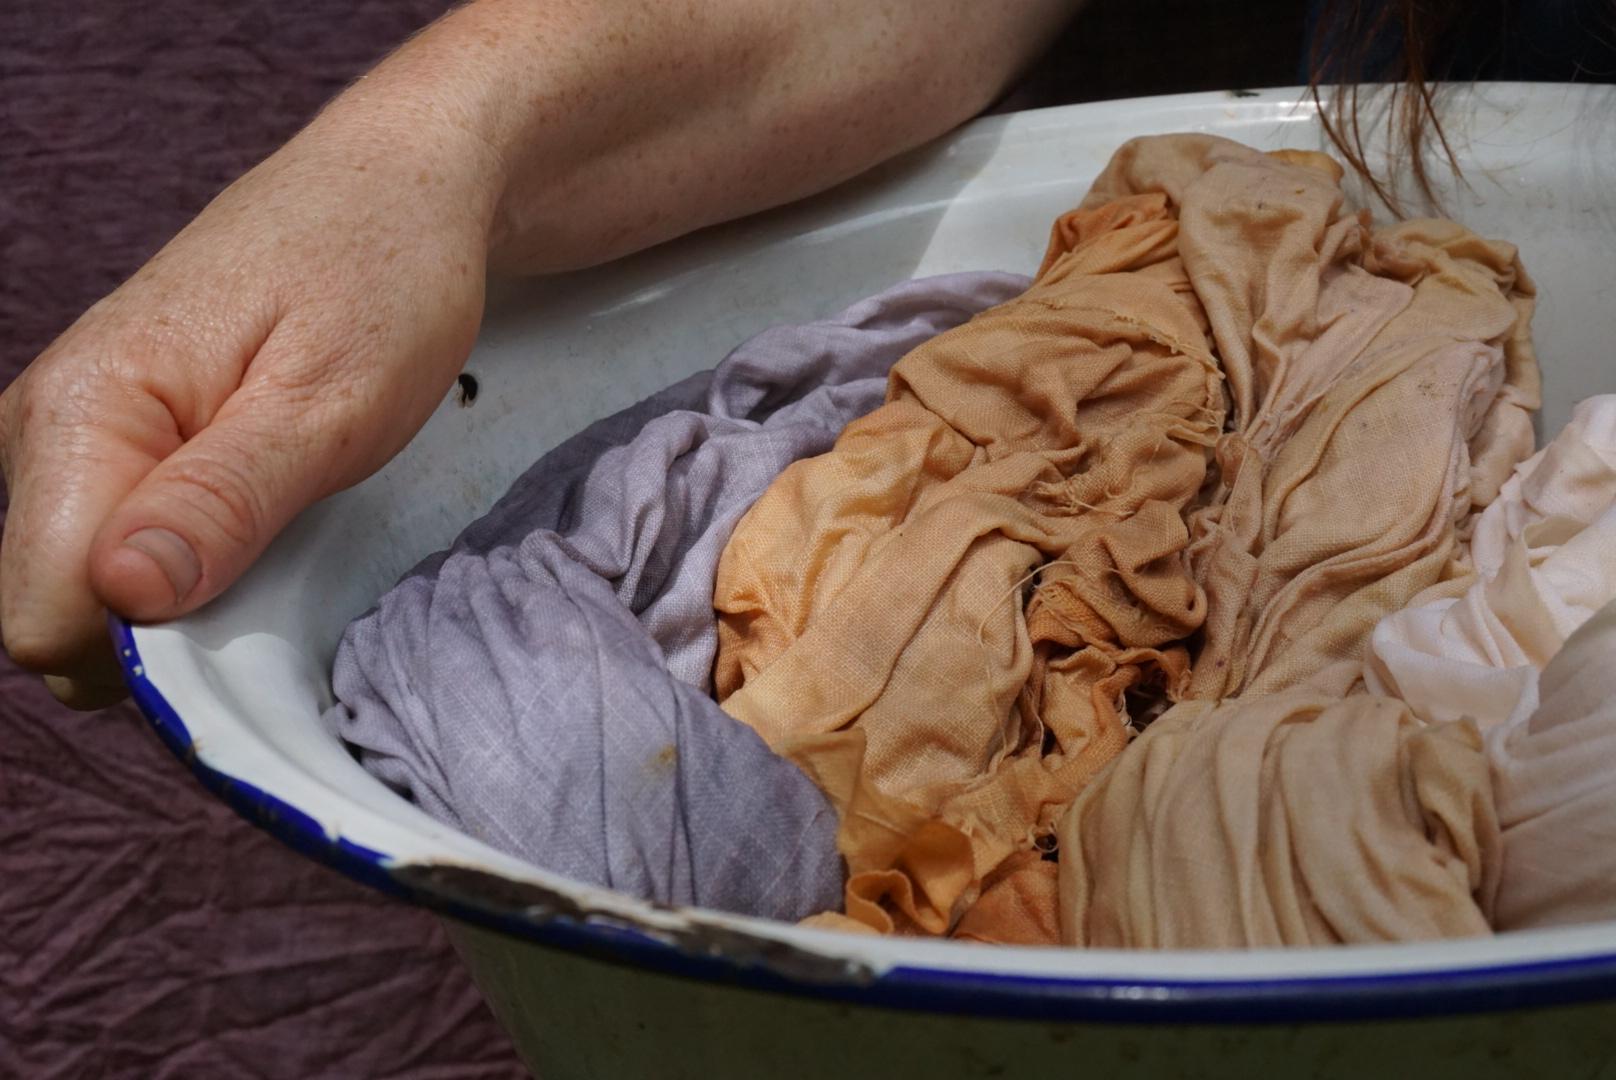 Naturally dyed fabric with hand. Purple orange. By Ellie Beck Petalplum